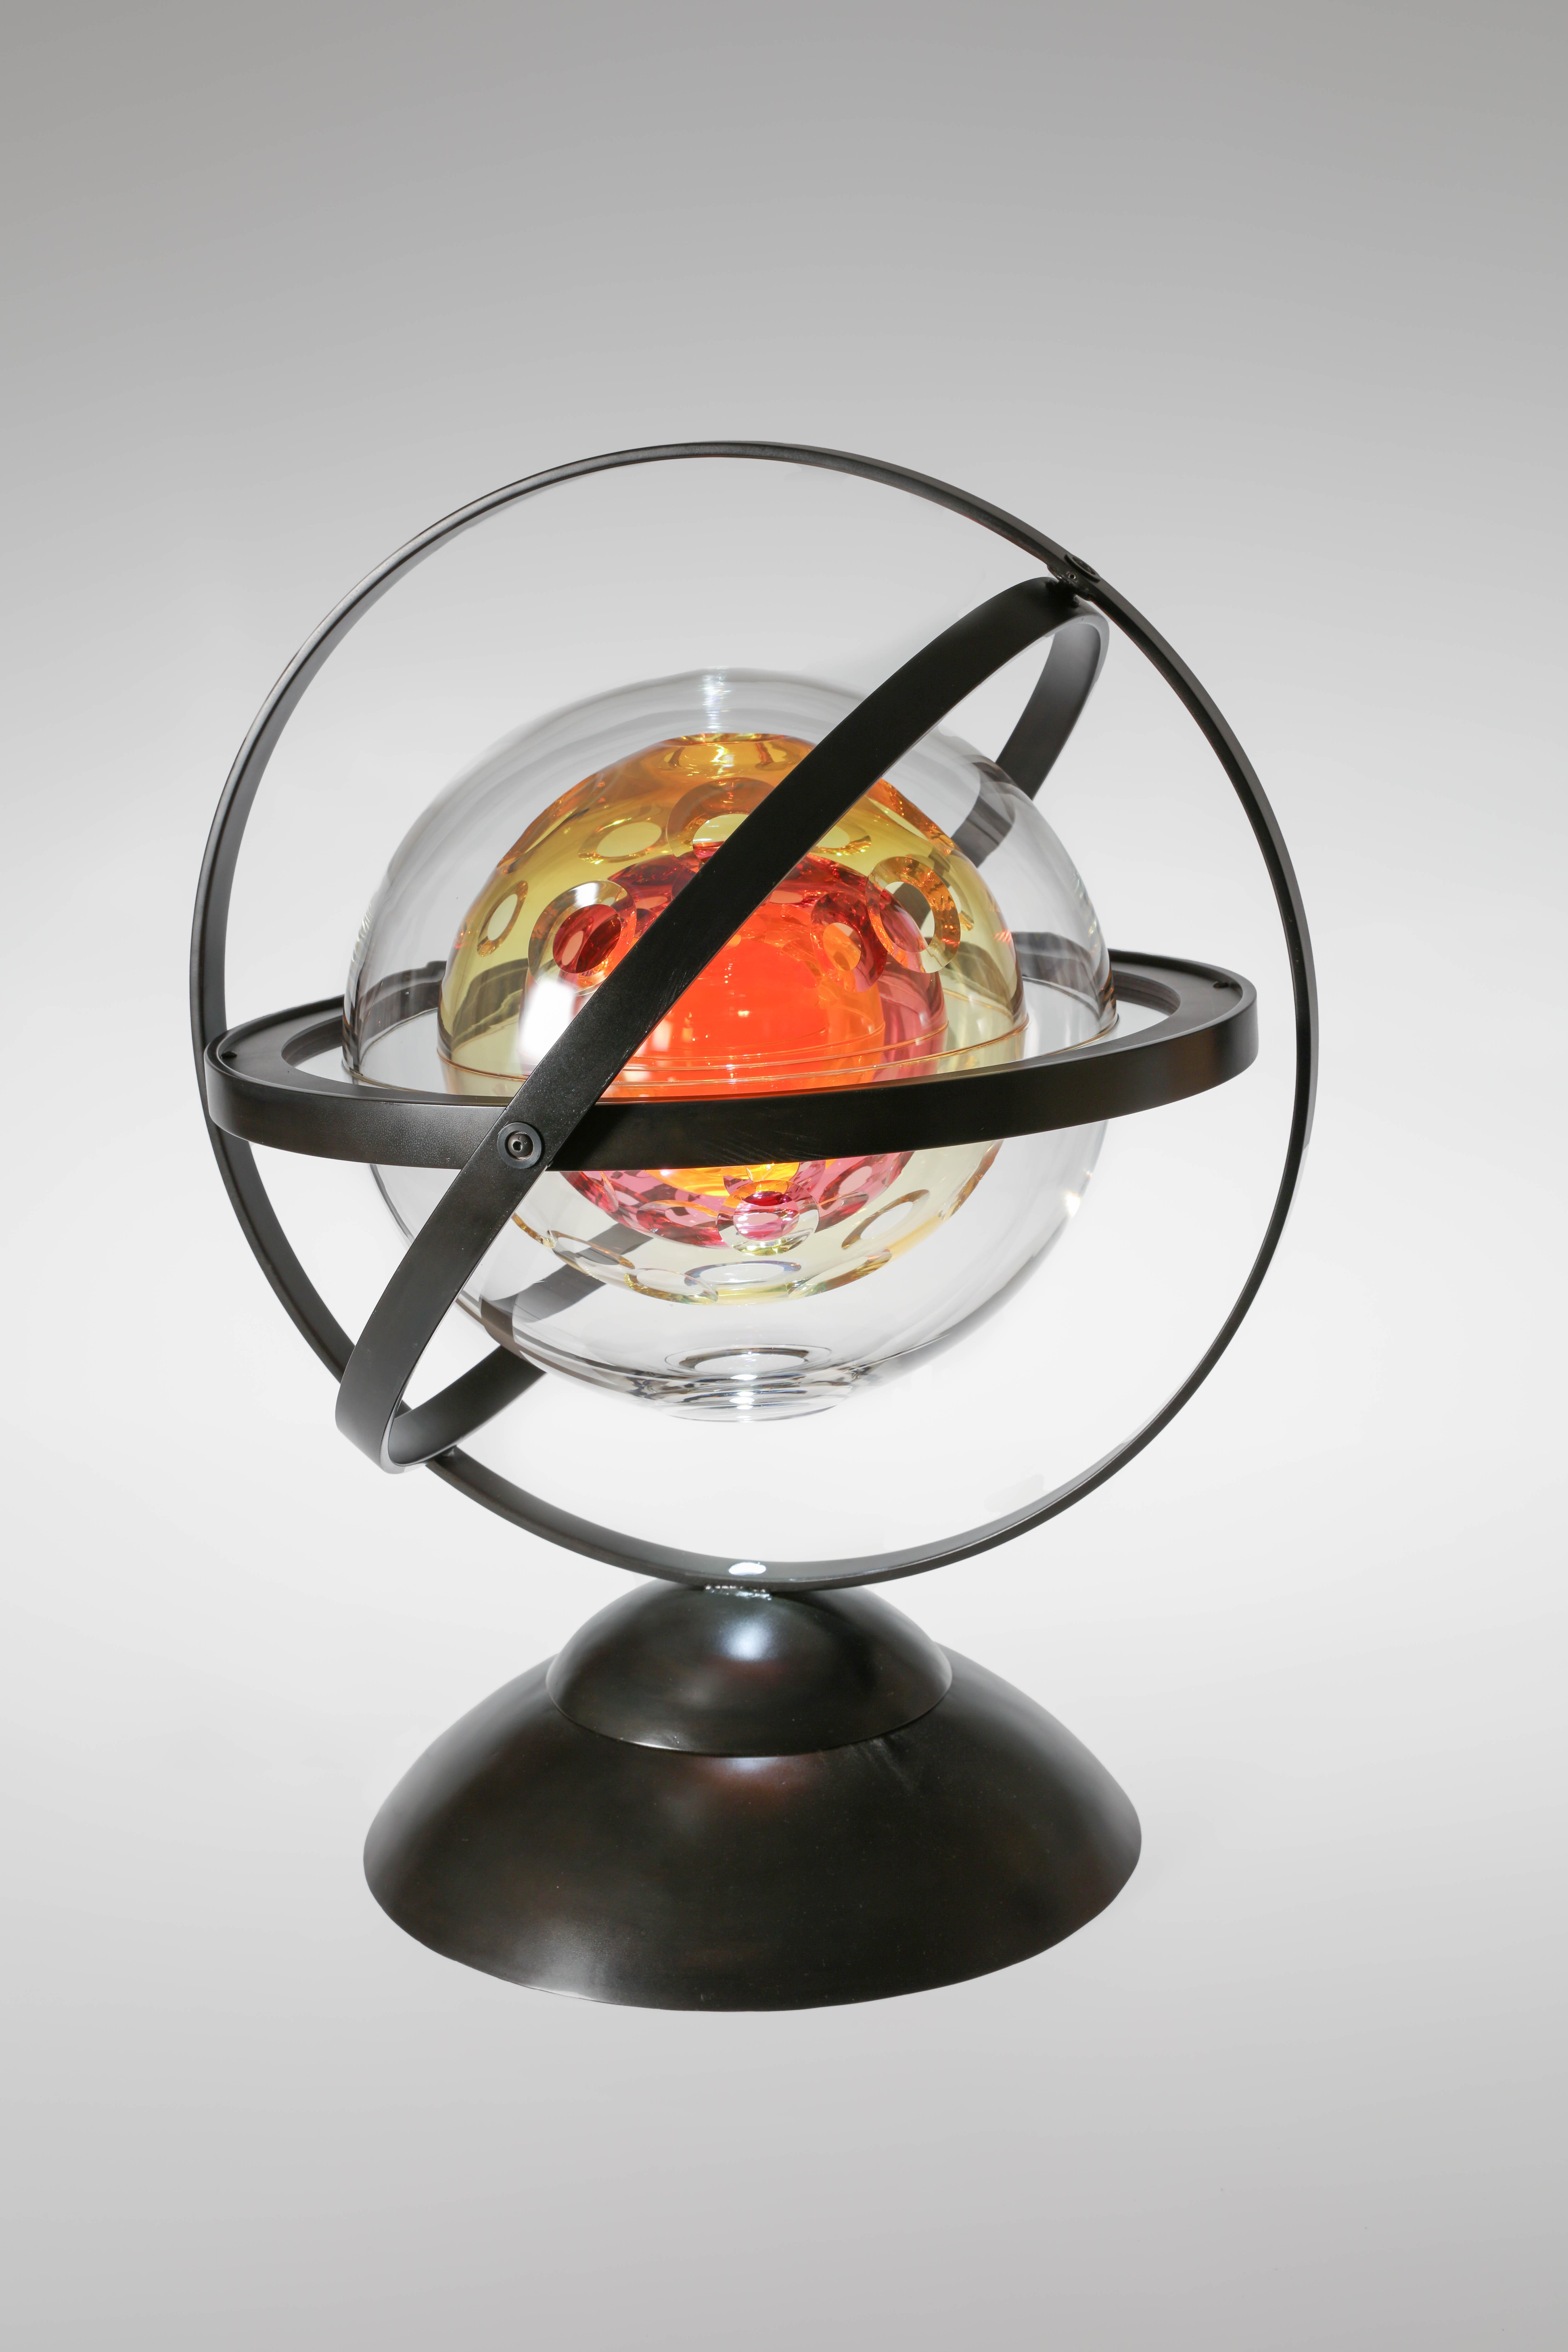 Glass sphere that spins in metal rings.